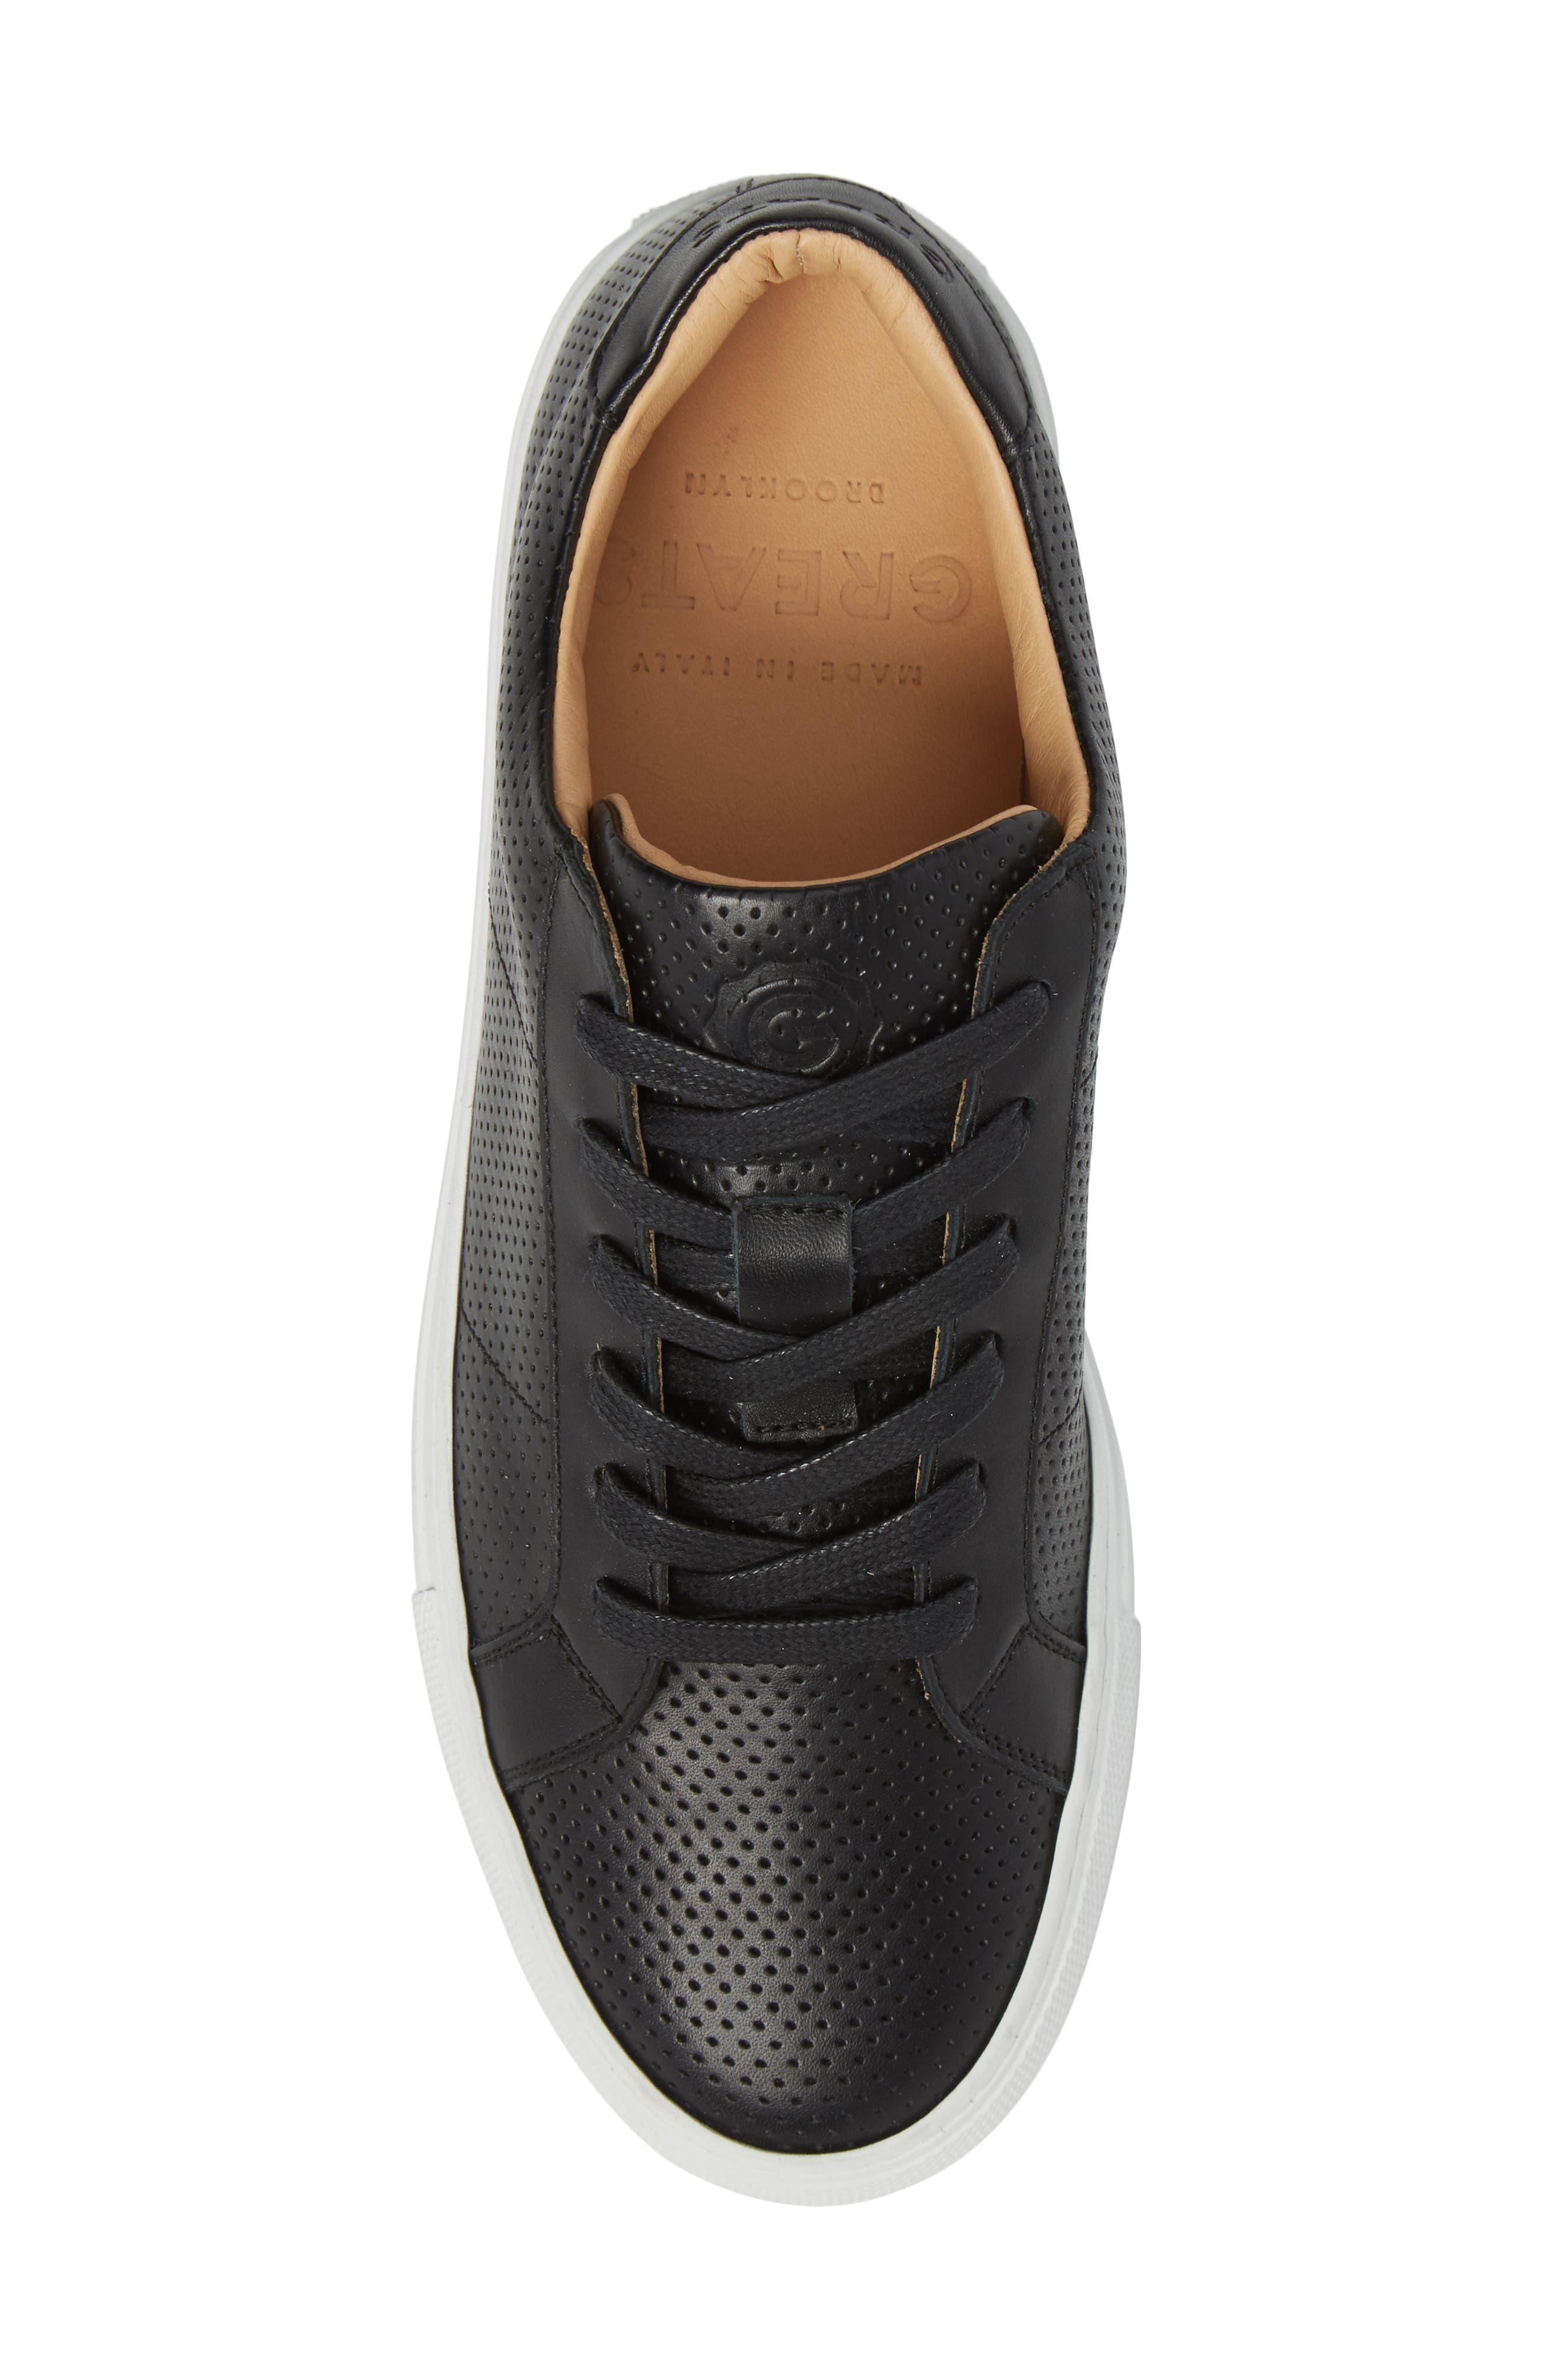 Royale Low Top Sneaker,                             Alternate thumbnail 5, color,                             BLACK PERFORATED